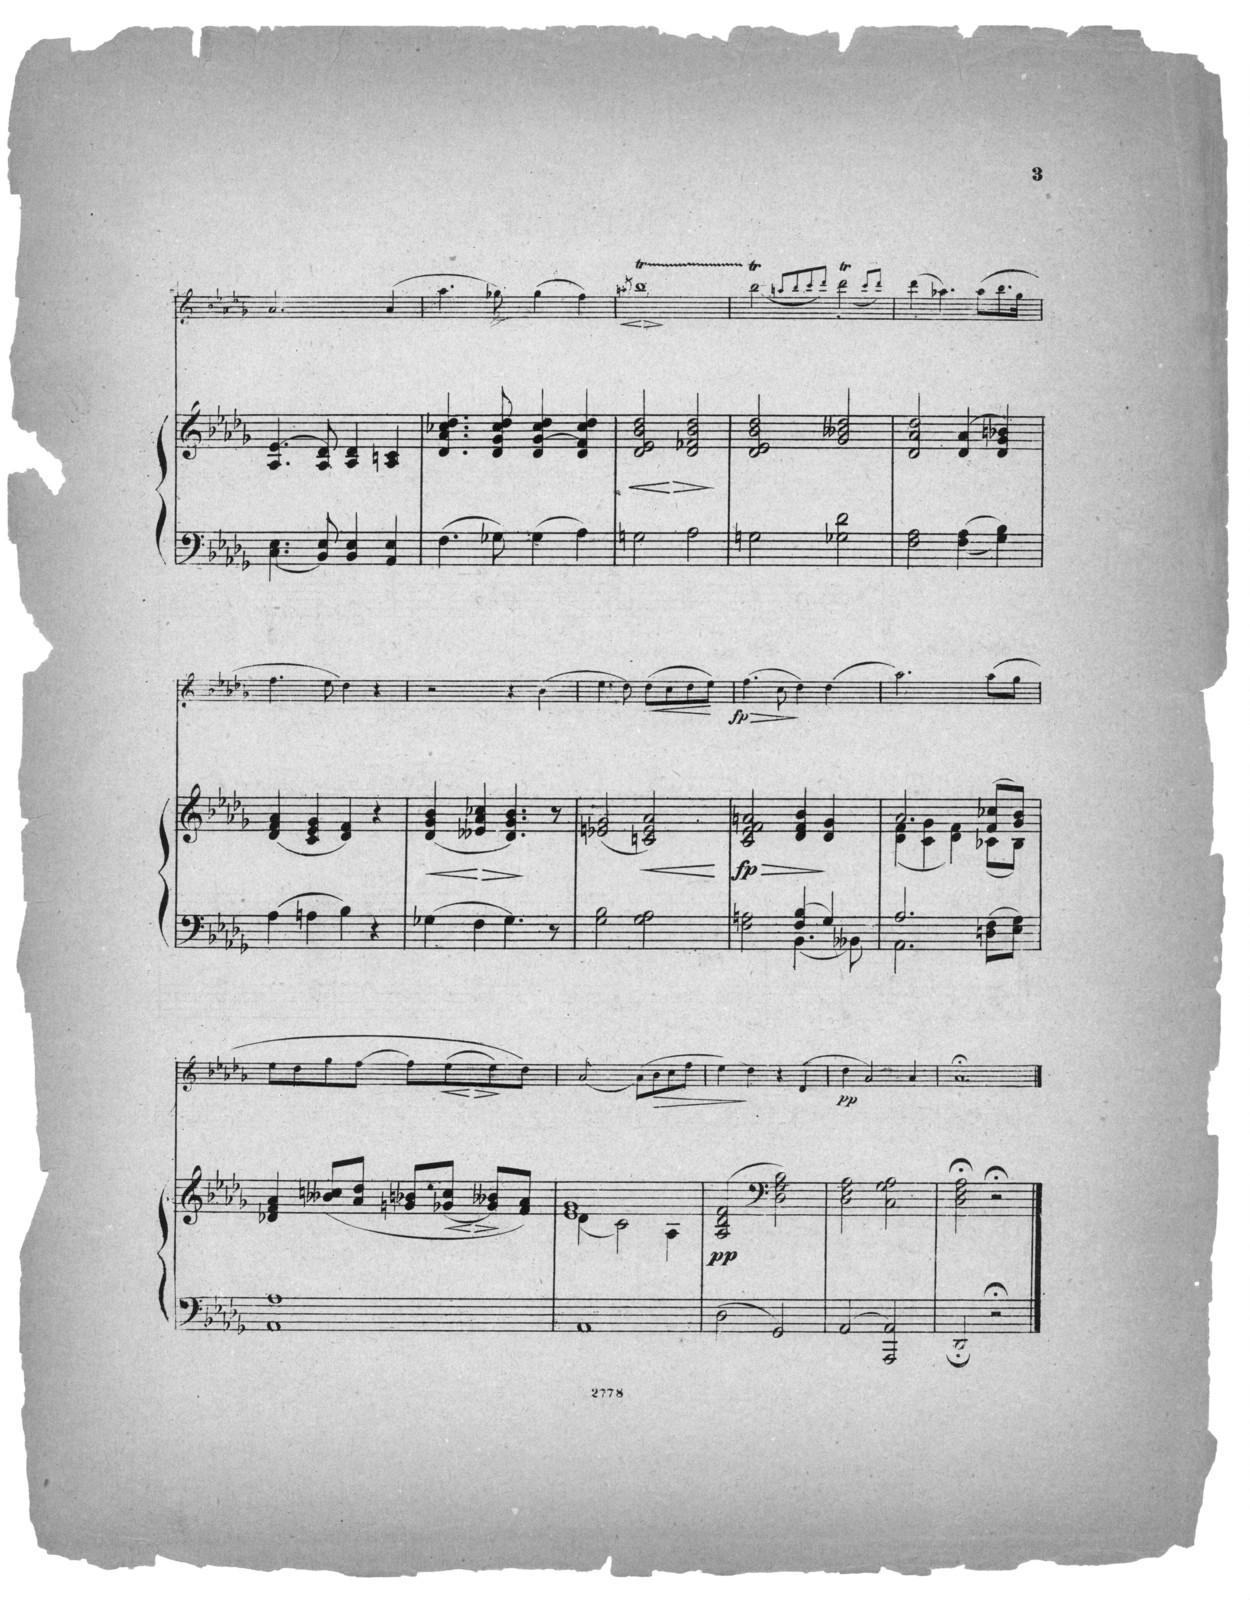 Abendlied, op. 85, no. 12